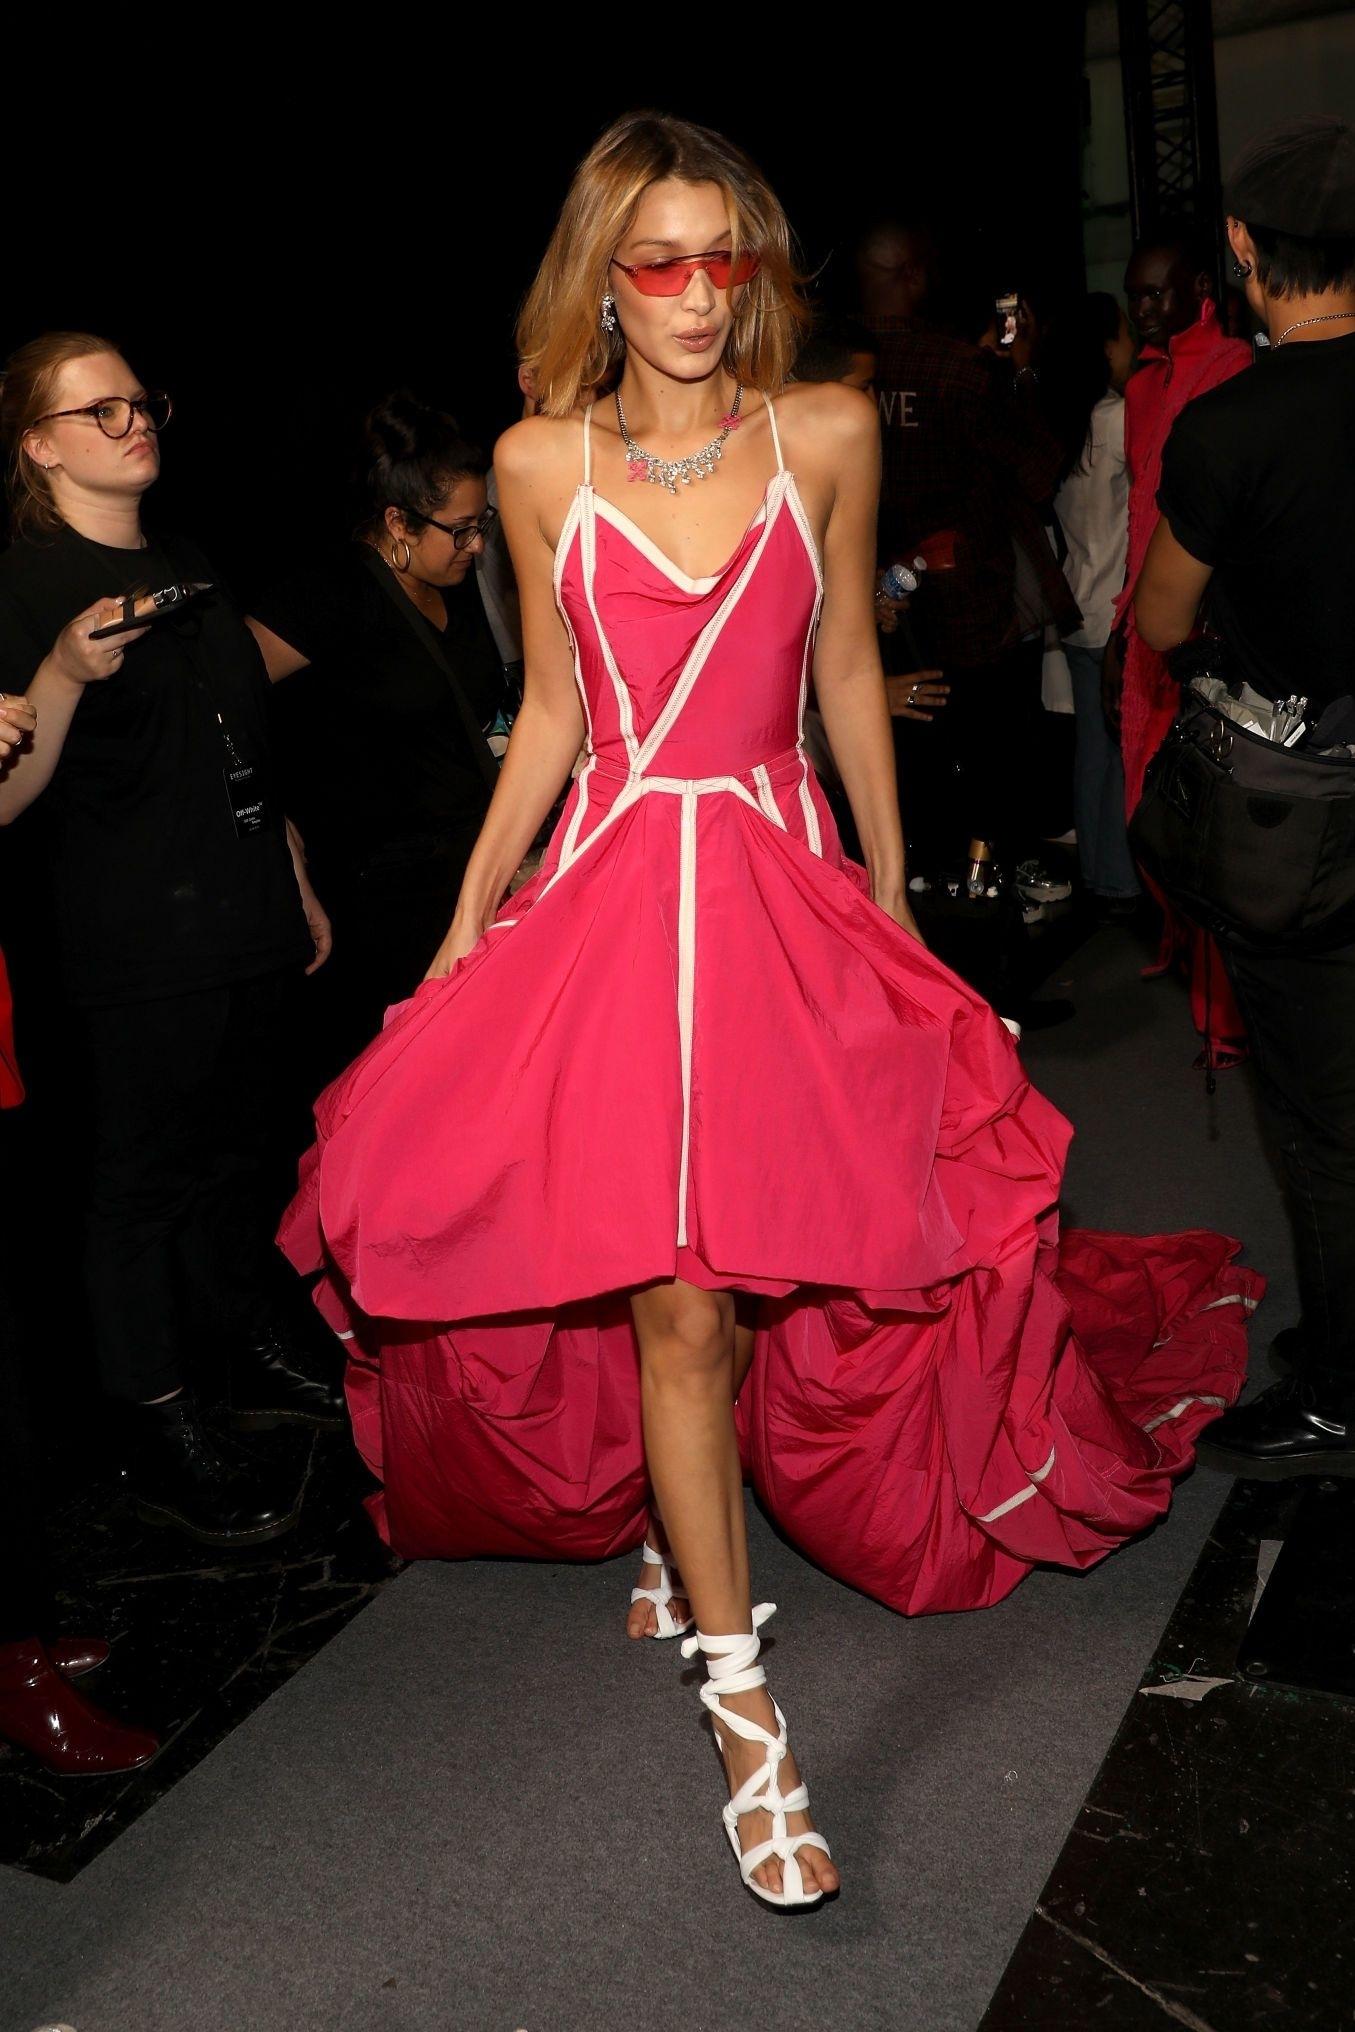 dress pink pink dress bella hadid model runway celebrity fashion week